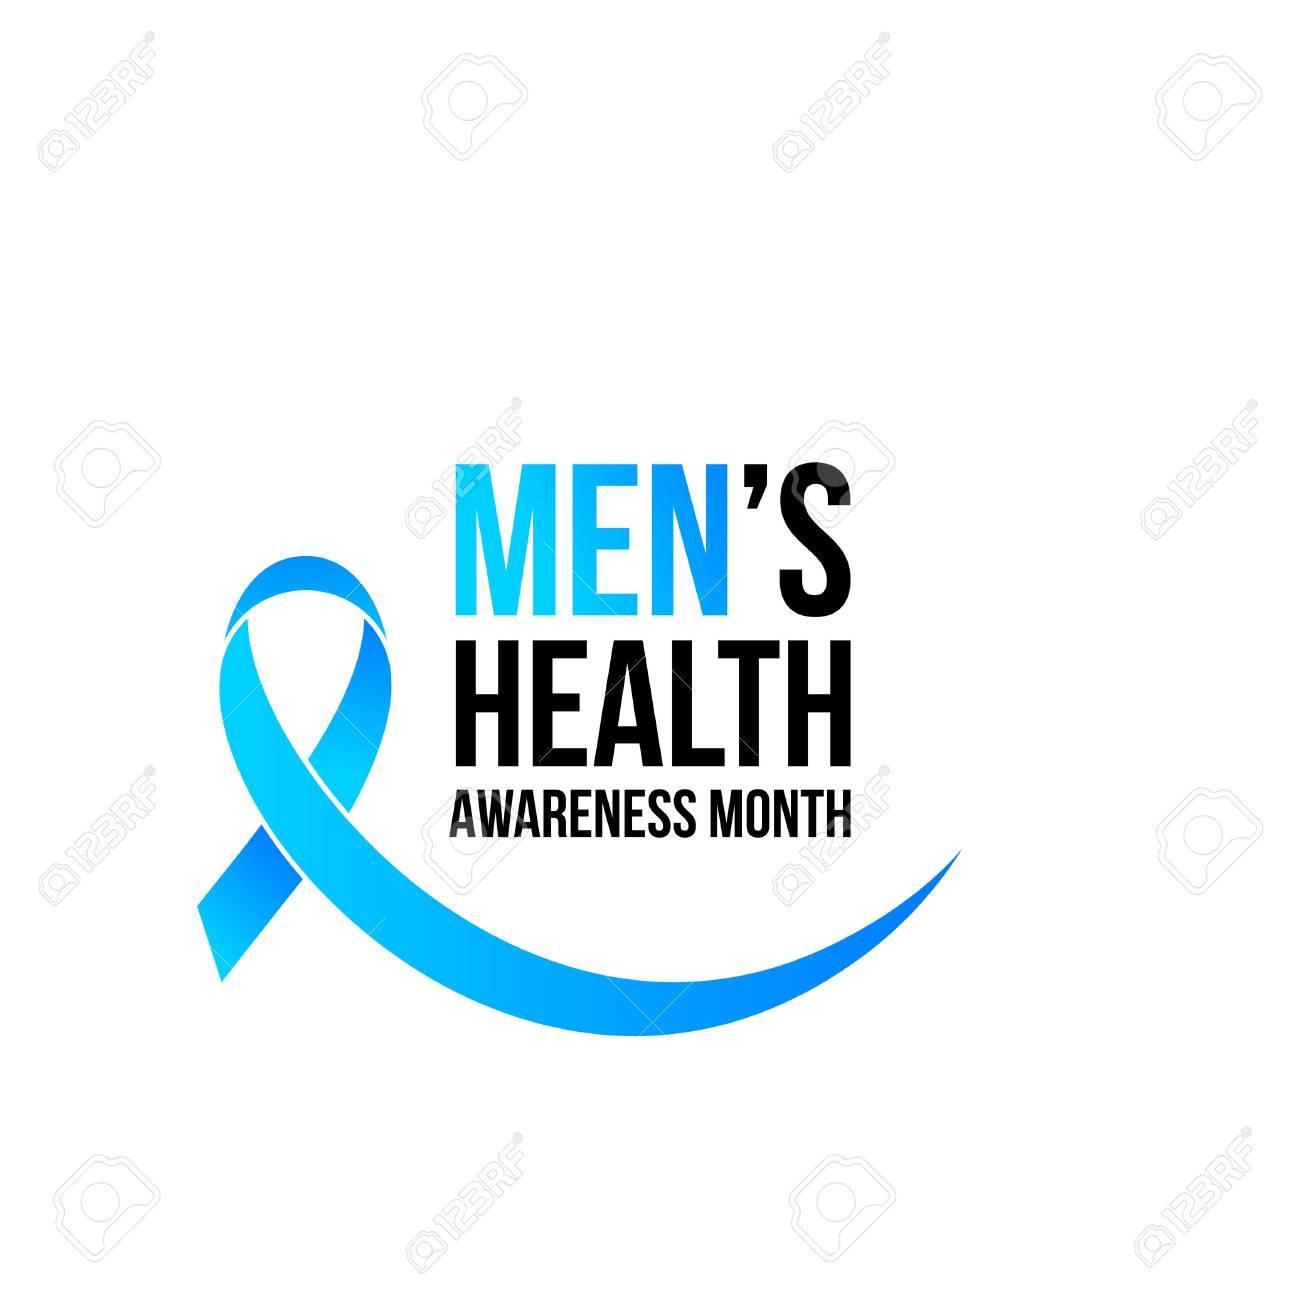 November men health awareness month poster or banner of blue ribbon. Vector no shave symbol for social solidarity event against prostate cancer campaign - 88394887